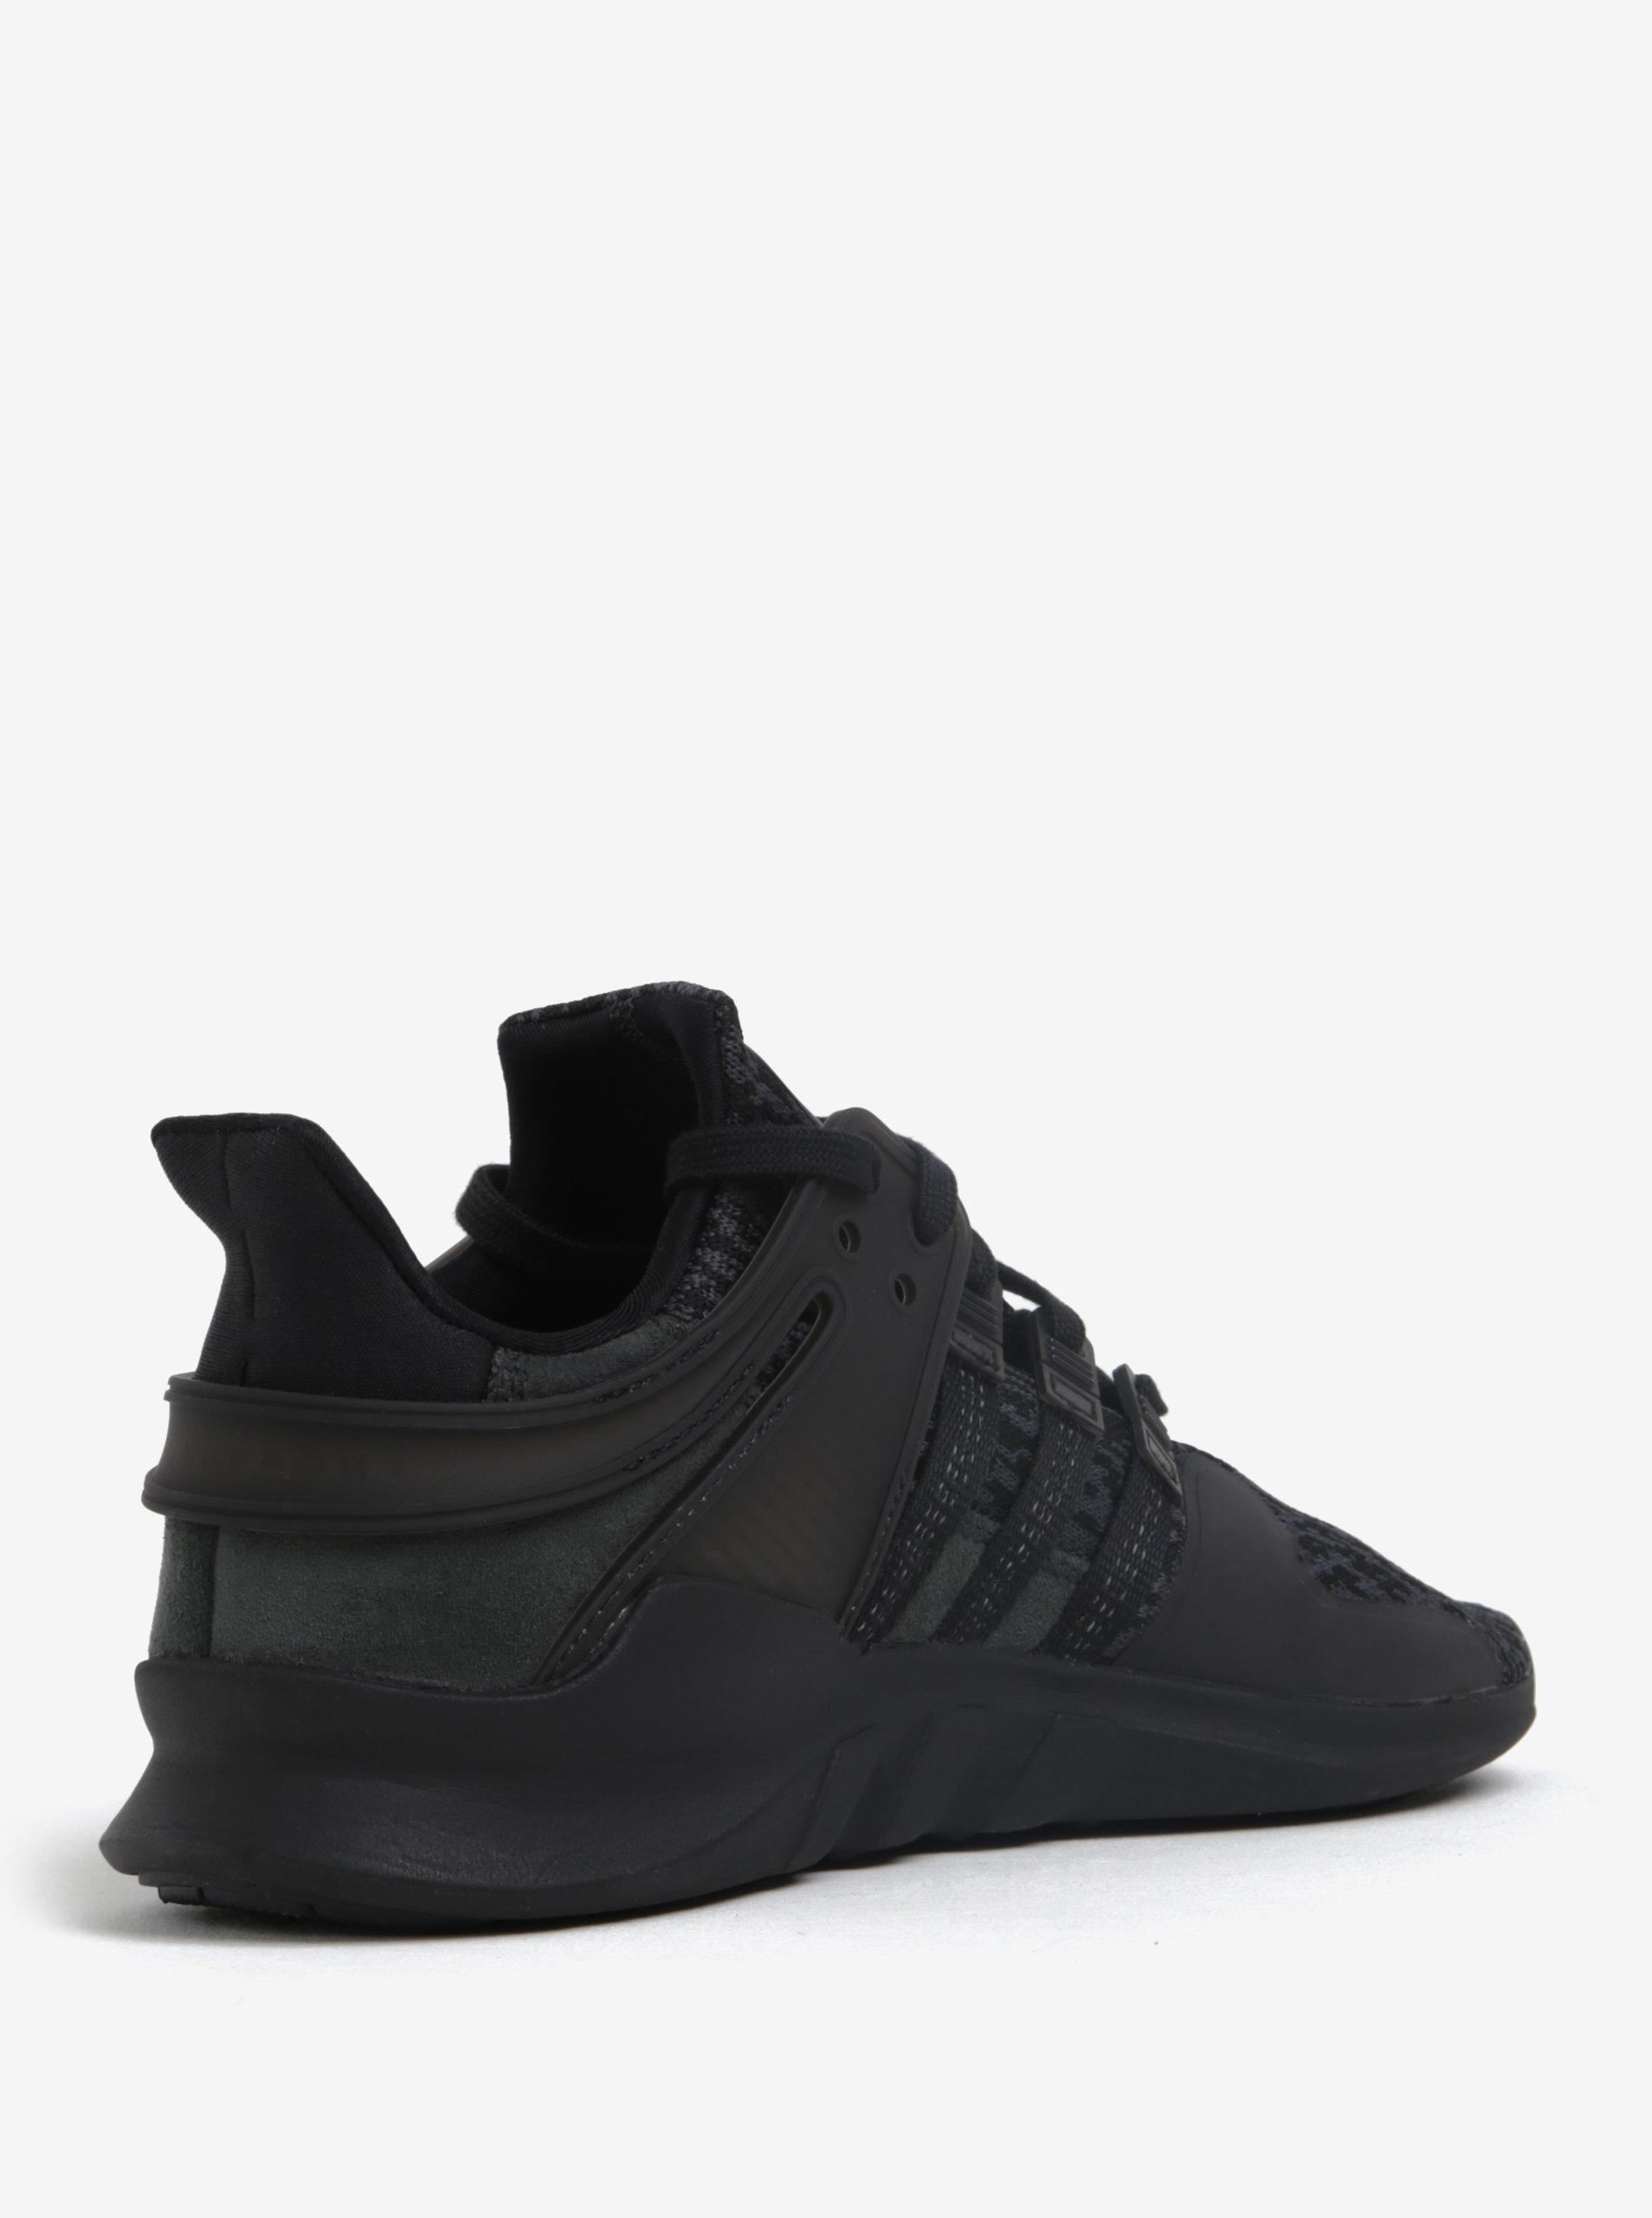 4e65413f4c02f Čierne pánske tenisky adidas Originals EQT Support ADV | ZOOT.sk